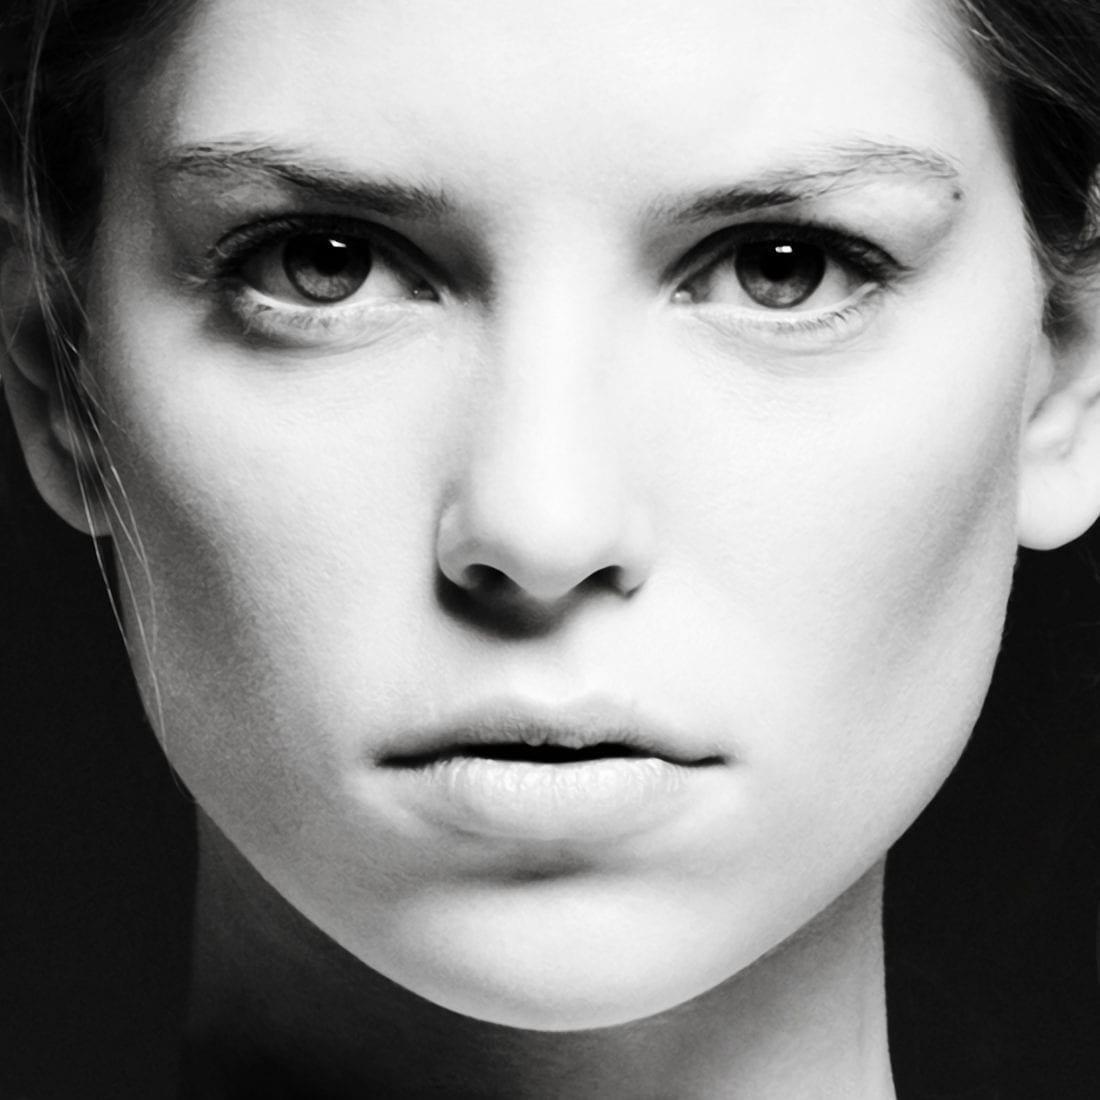 Amanda Portrait